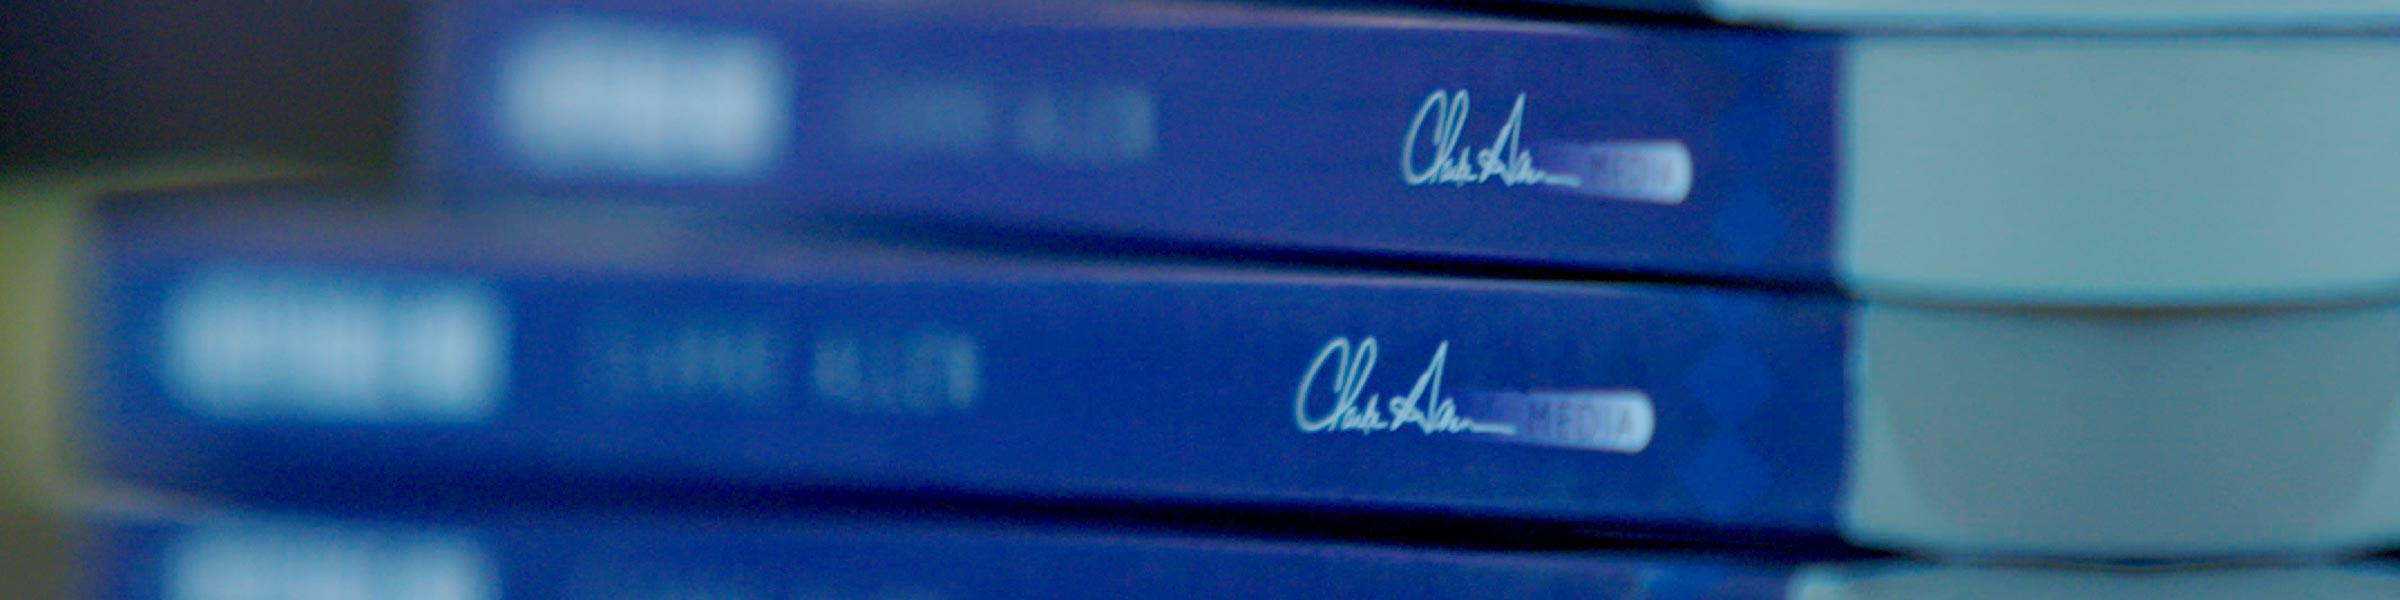 Clarke Allen Book